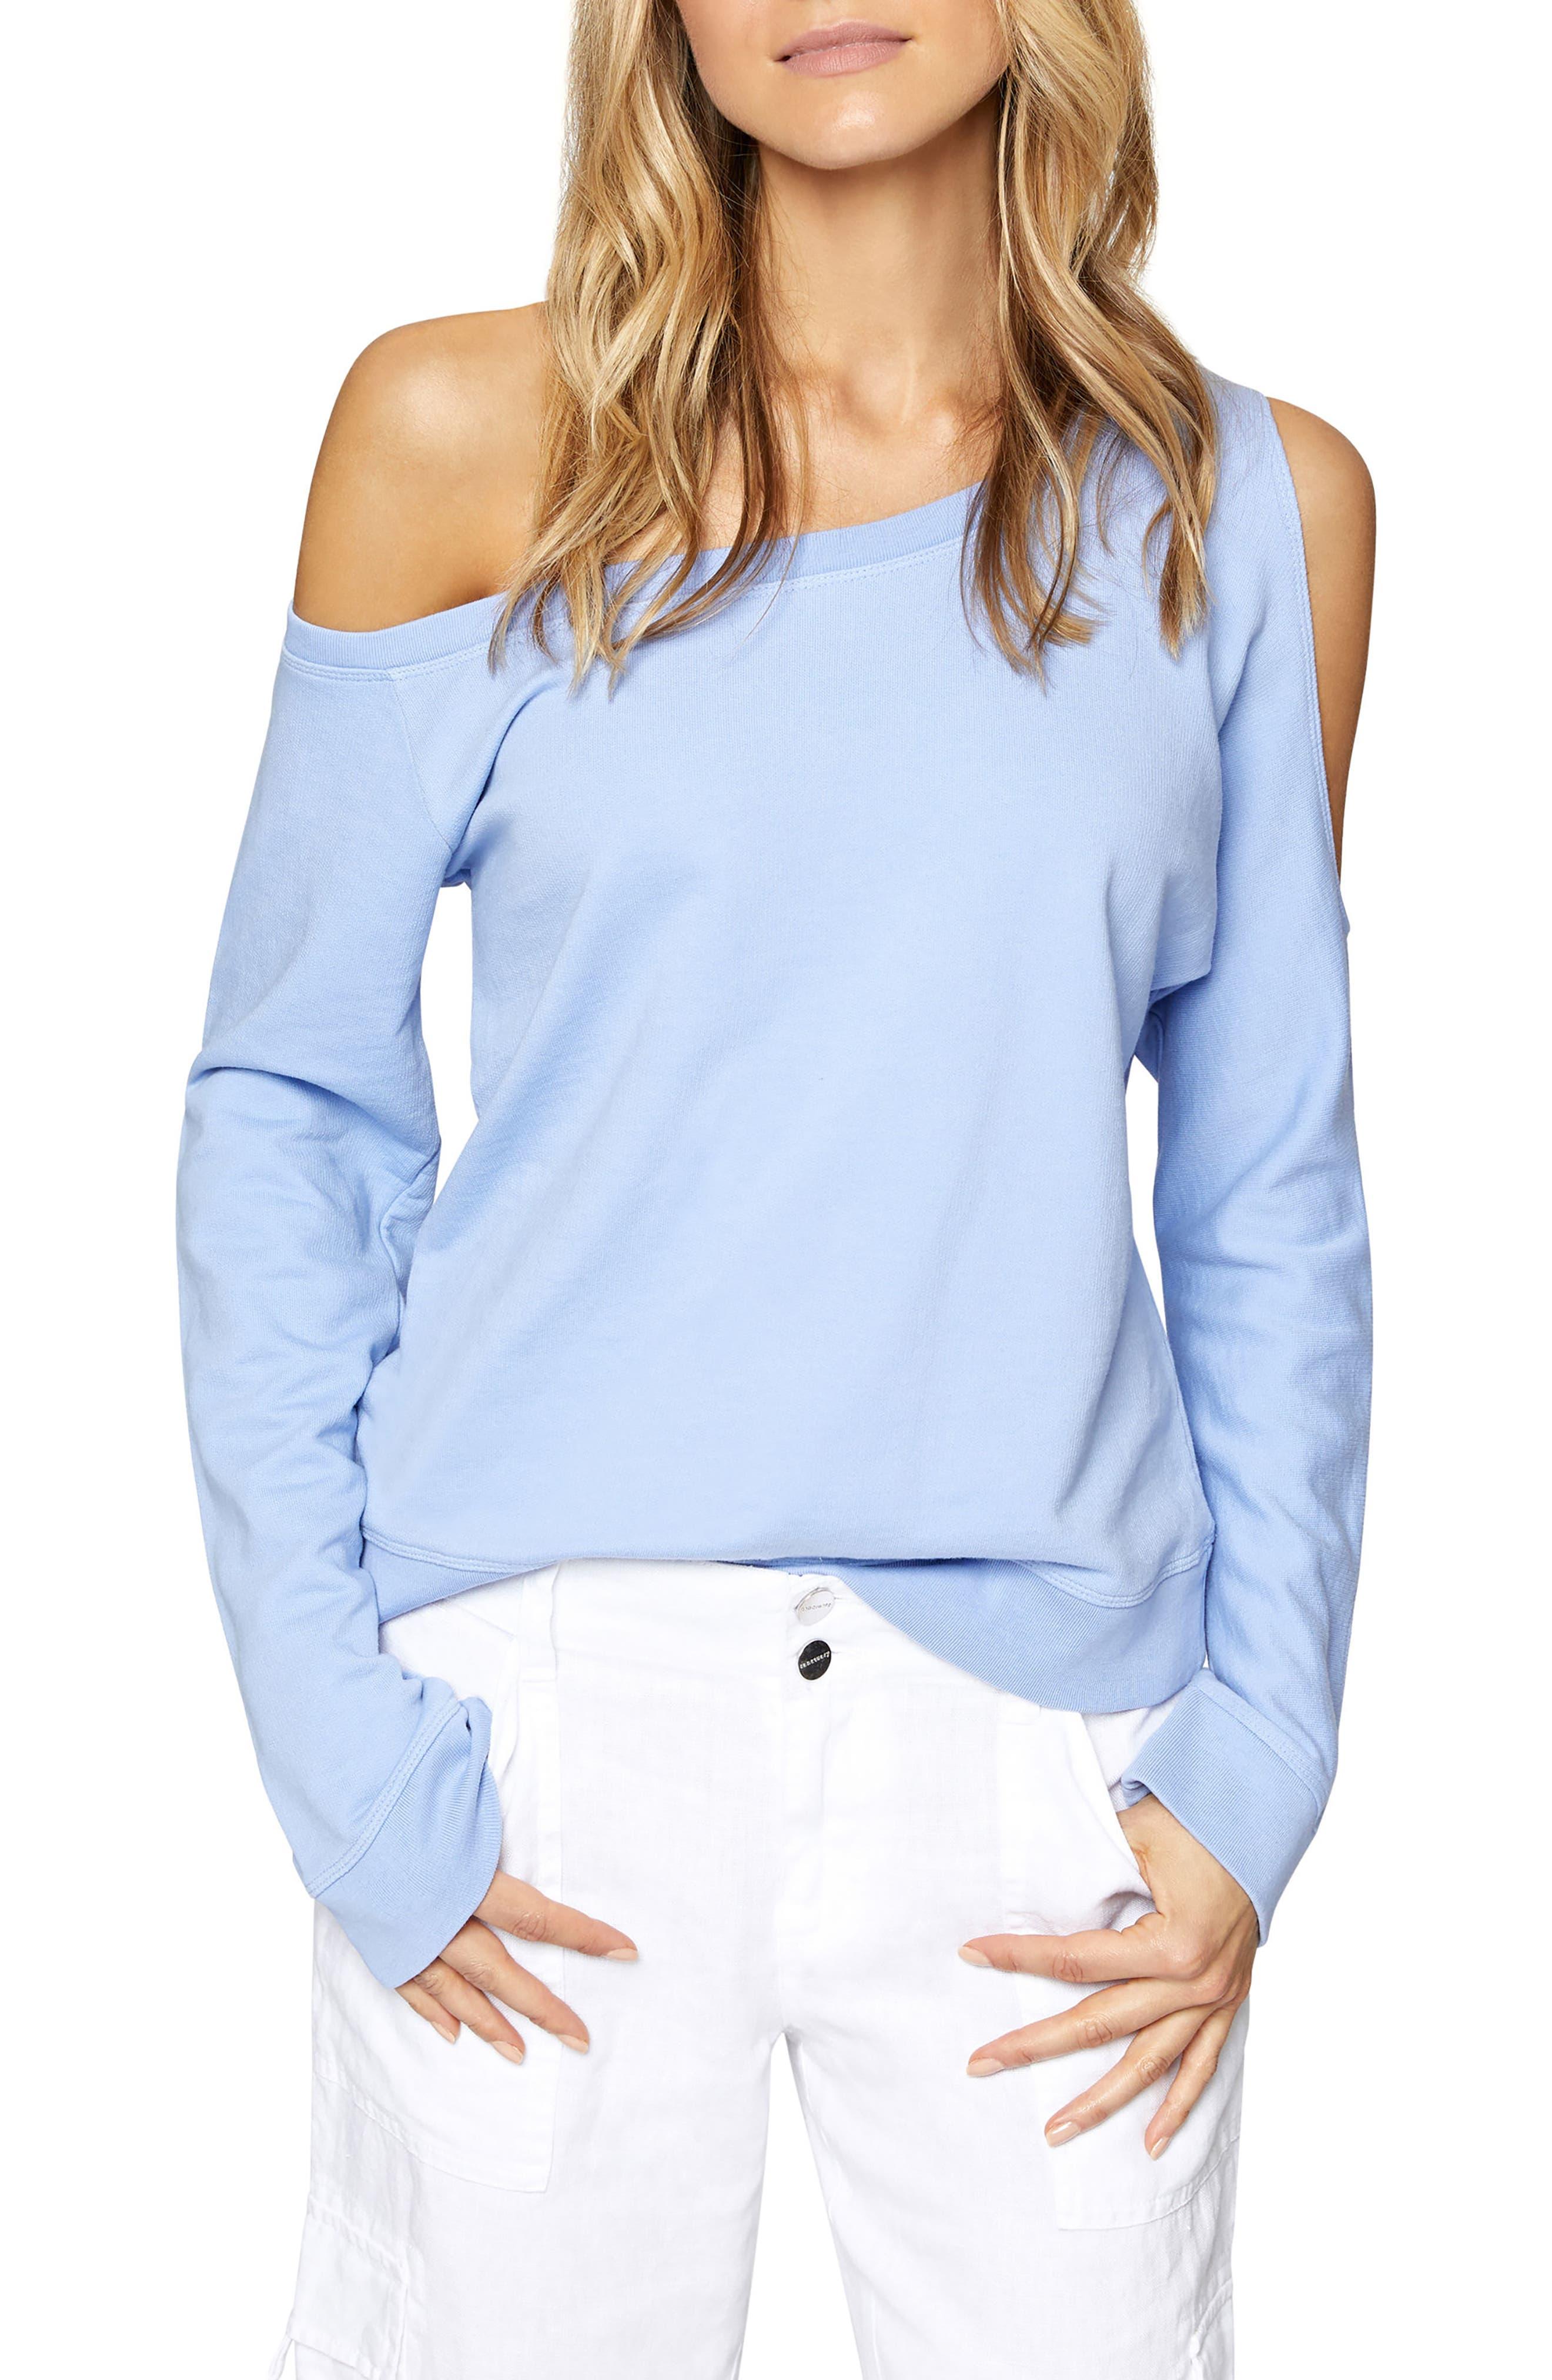 Alexi Asymmetrical Sweatshirt,                             Main thumbnail 1, color,                             450